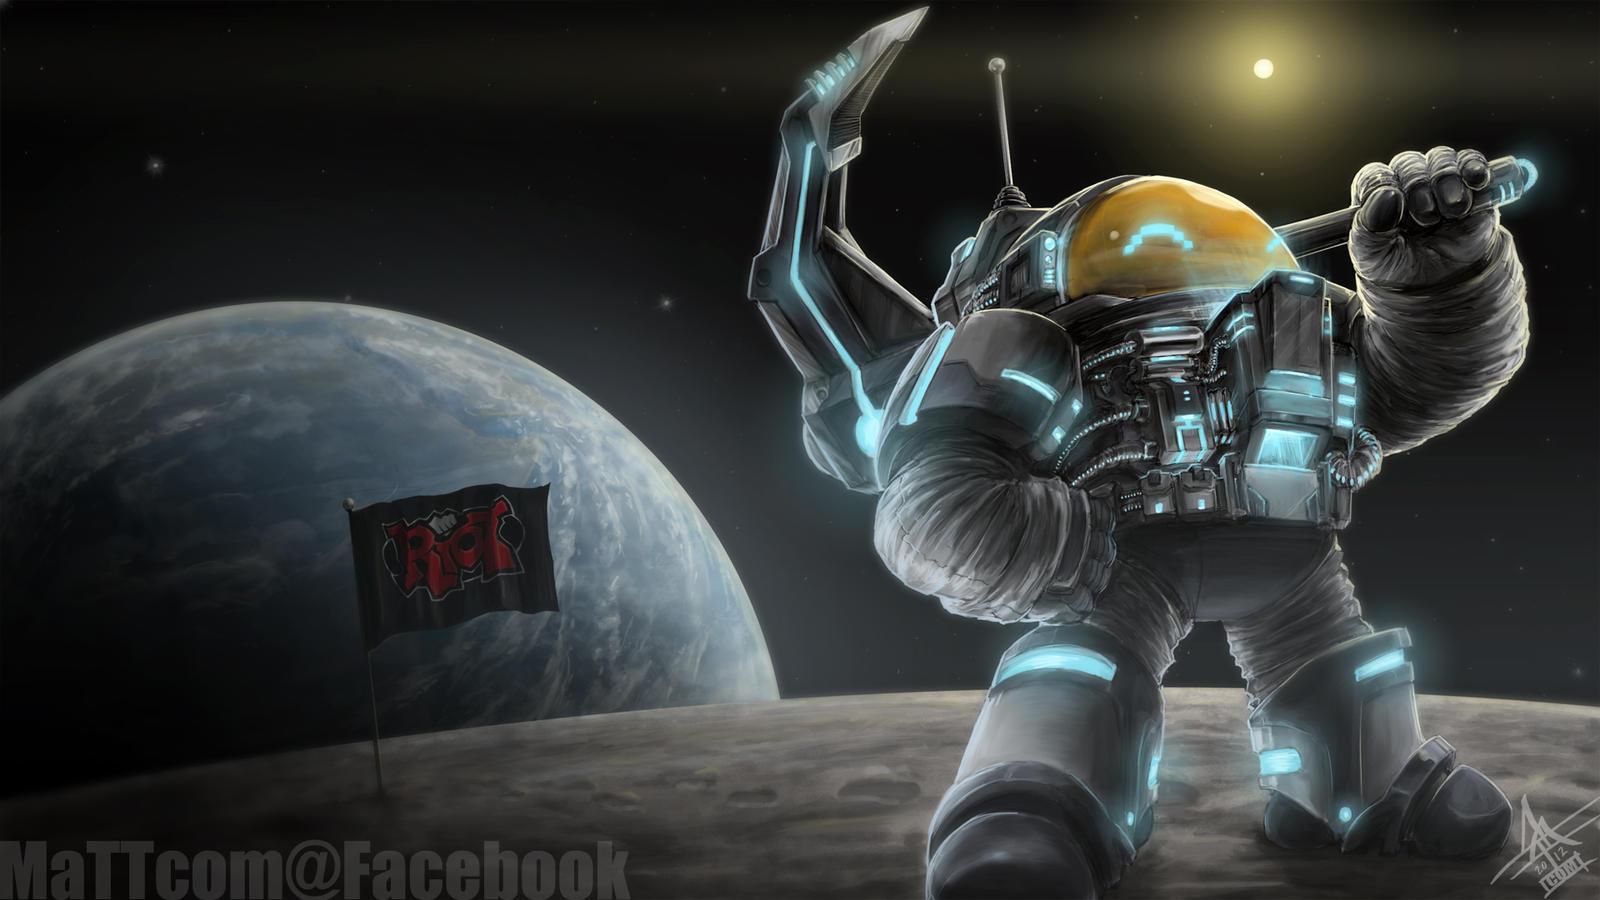 AstroNautilus by MaTTcomGO